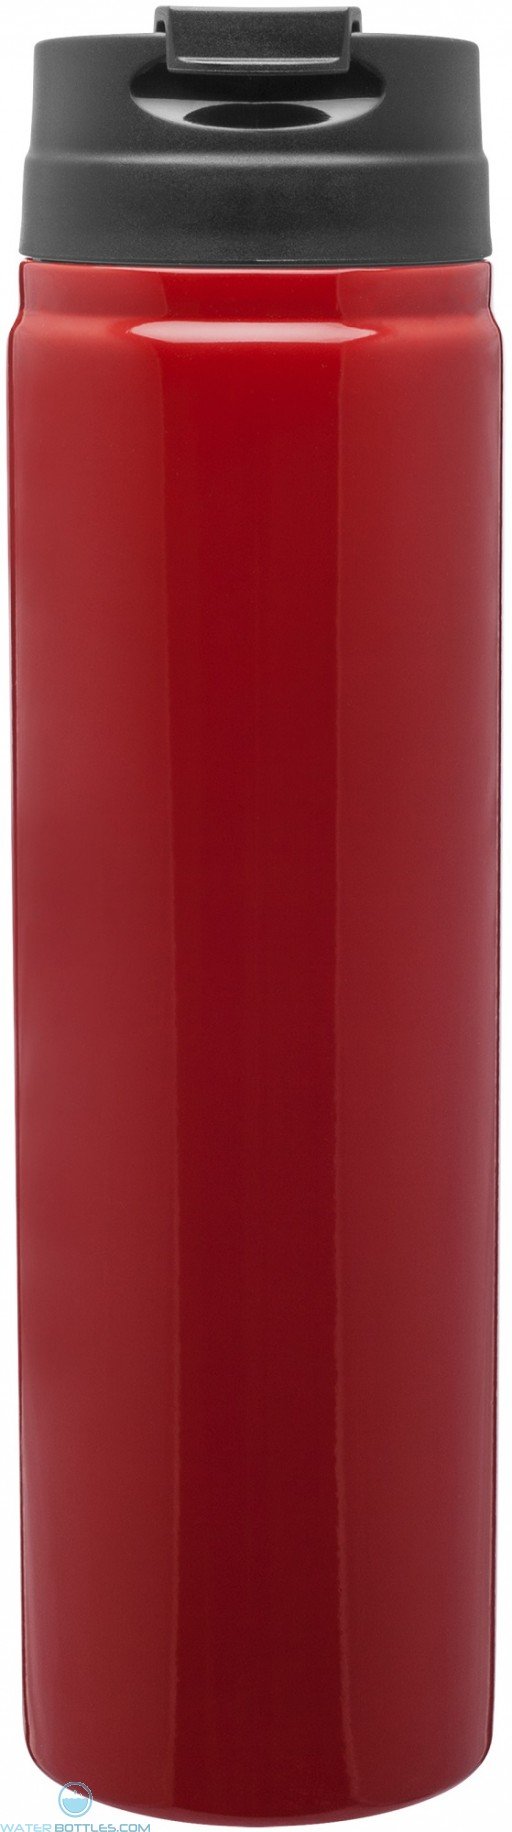 H2Go Nexus Thermal Tumblers 24 oz-Red